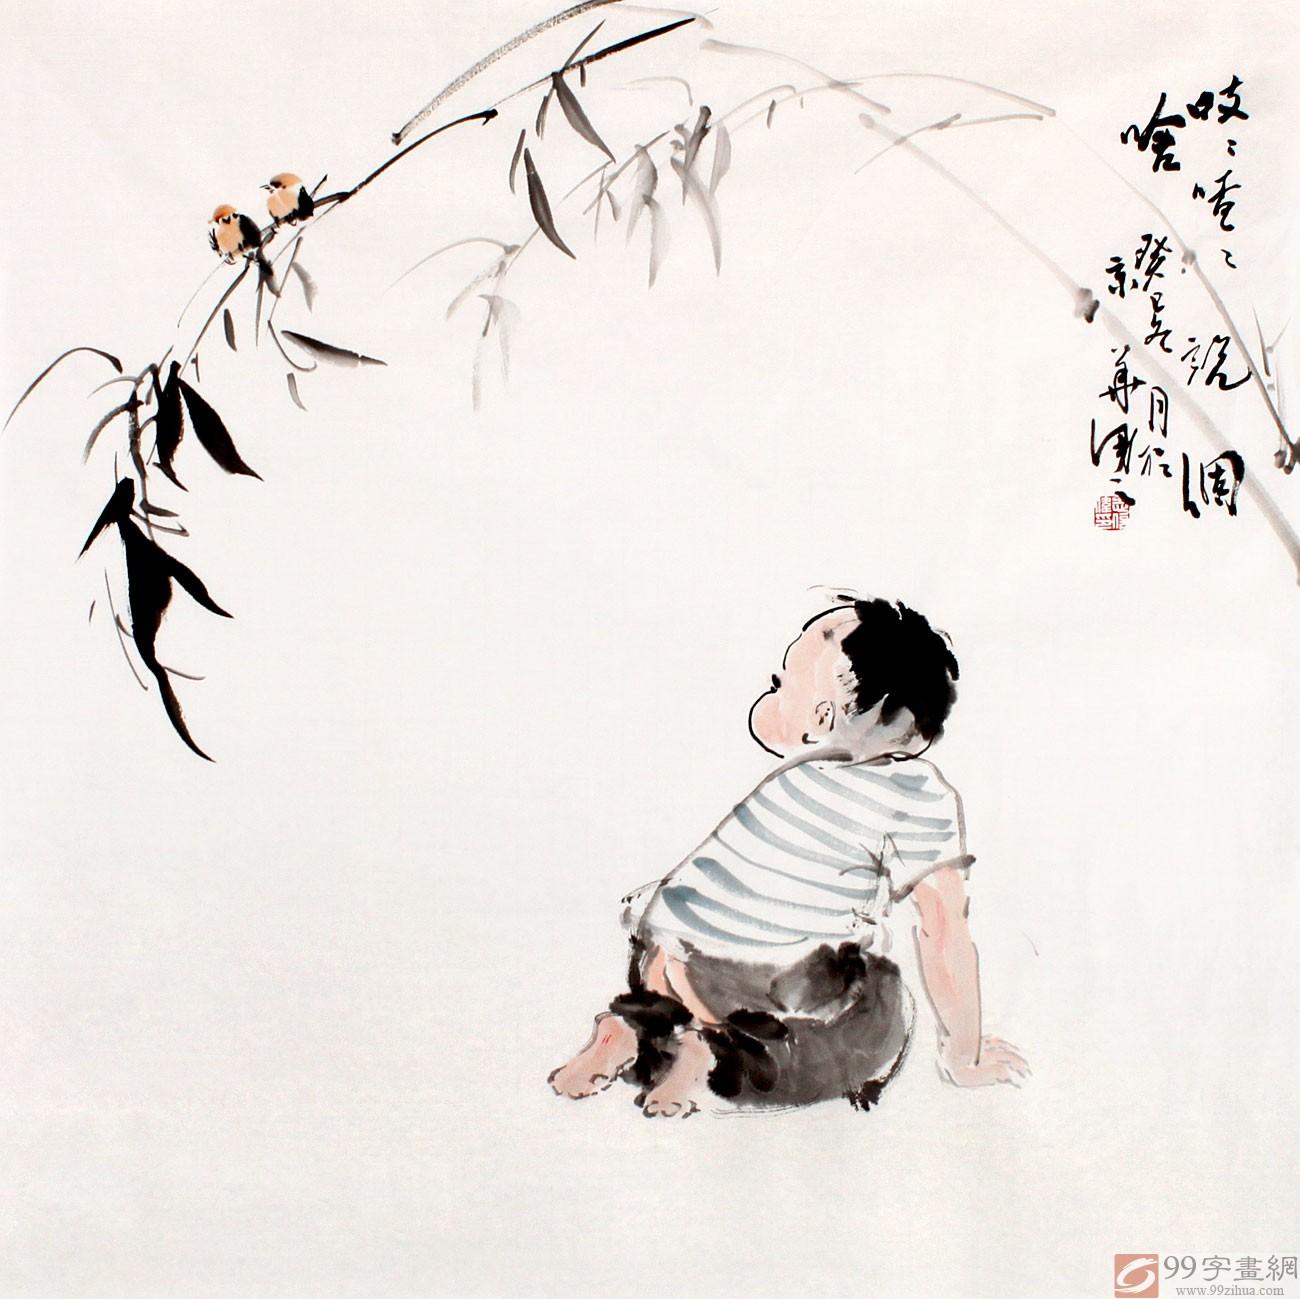 qa陈漫之四尺斗方童趣国画《吱吱喳喳说个啥》(询价)图片